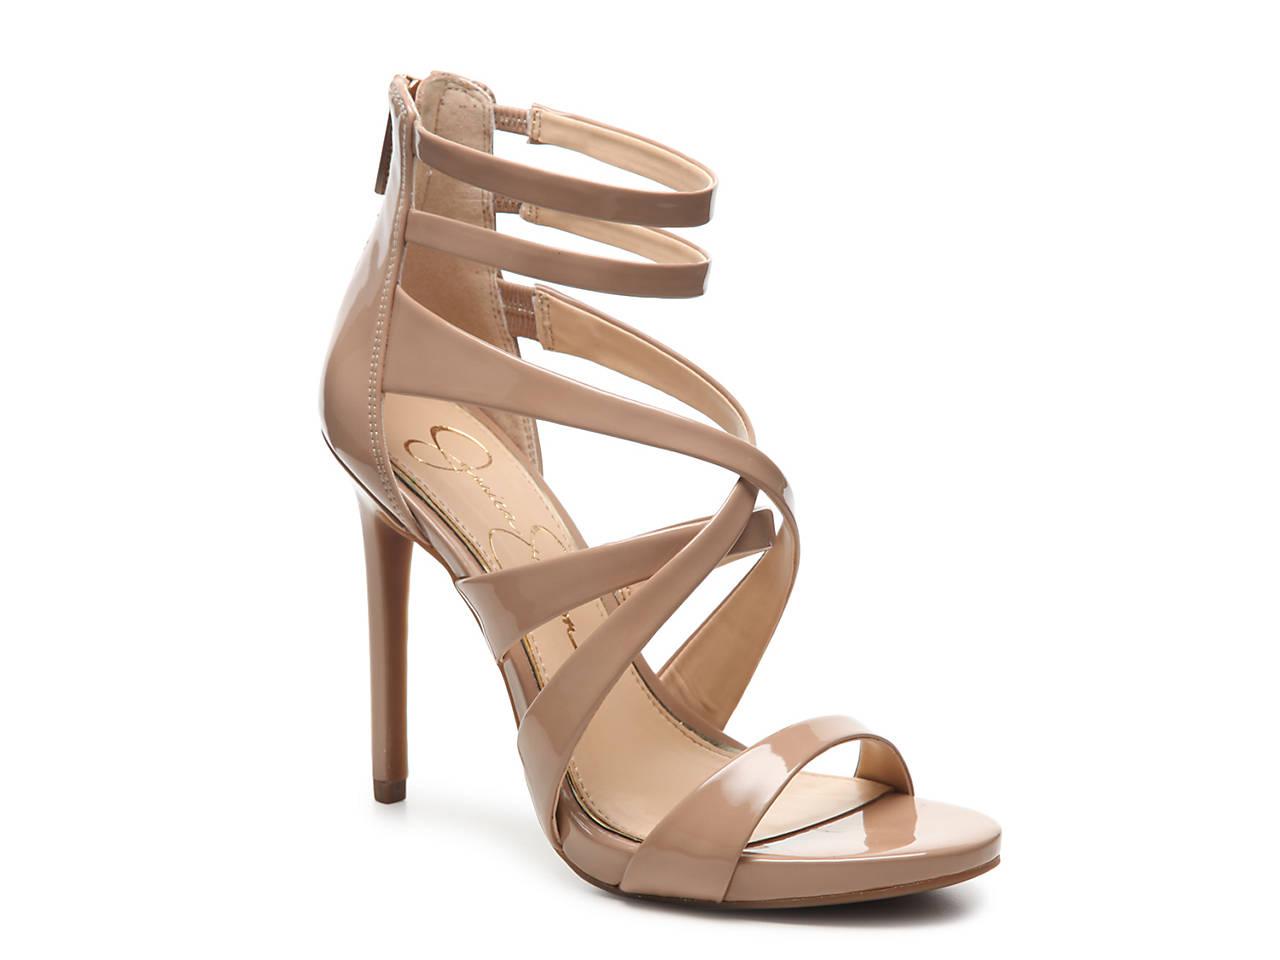 94b43c44792 Jessica Simpson Rayomi Platform Sandal Women s Shoes